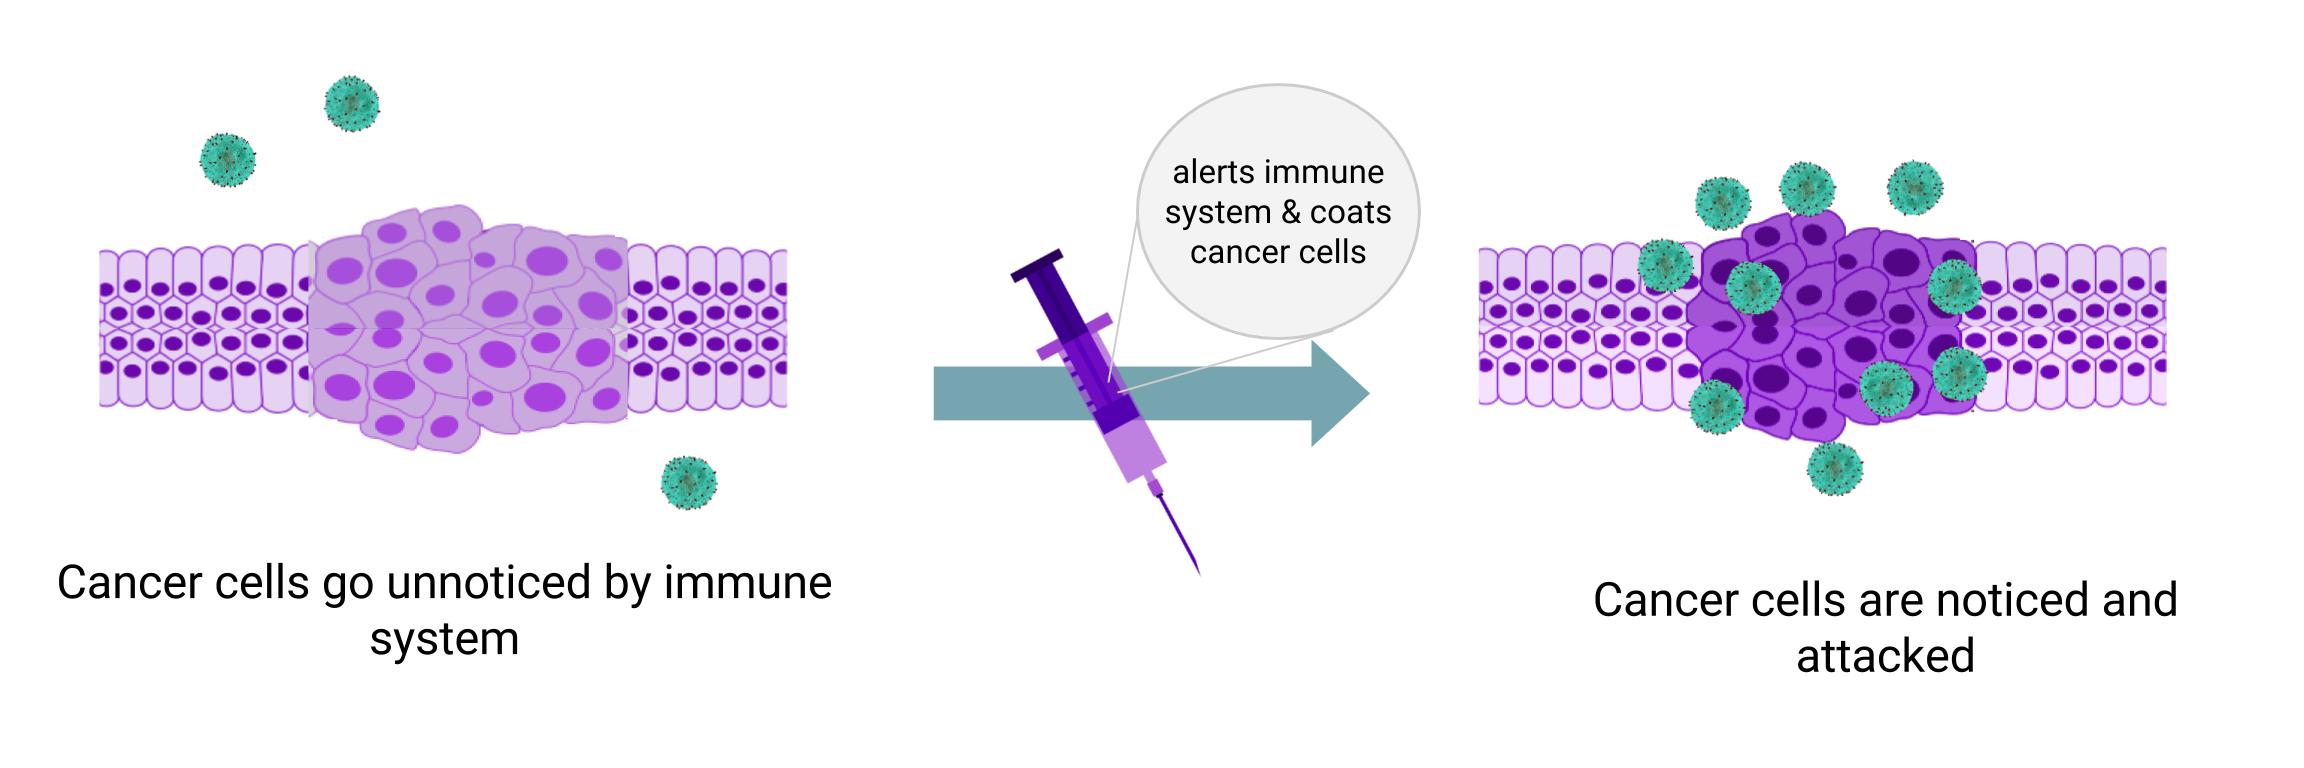 Immunoengineering a Better Cancer Treatment